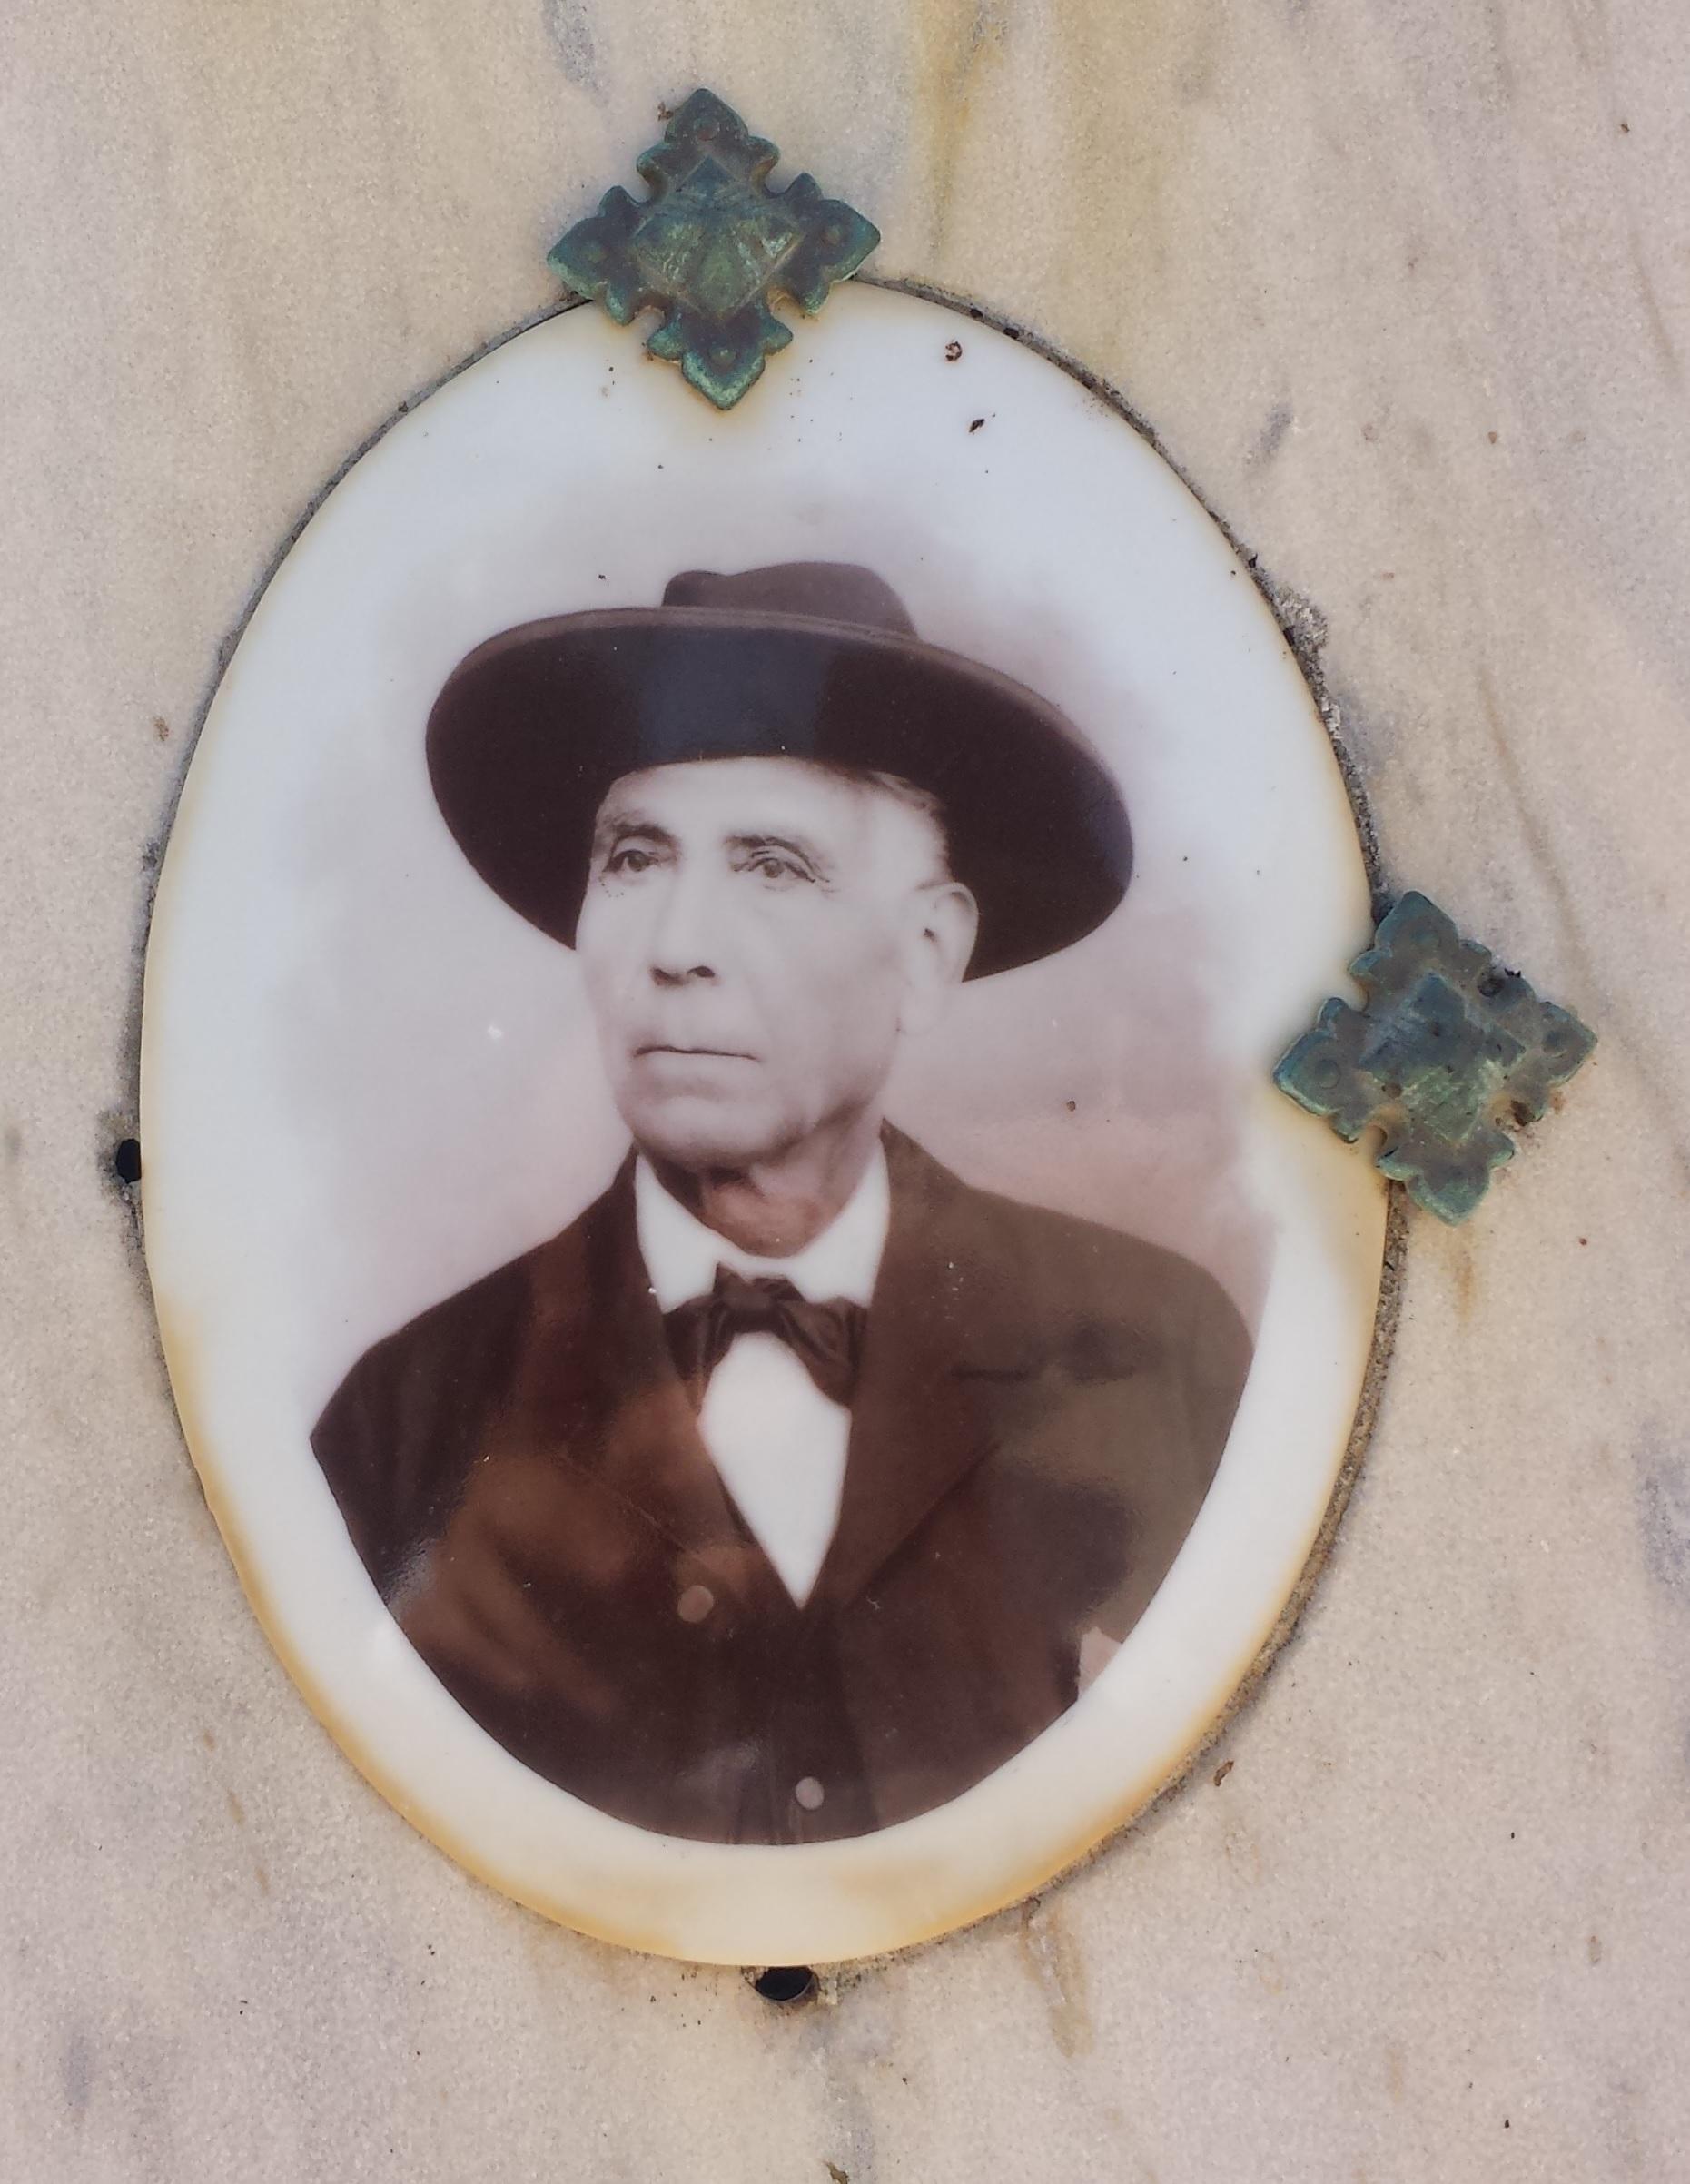 Antonino Curro Crisafulli